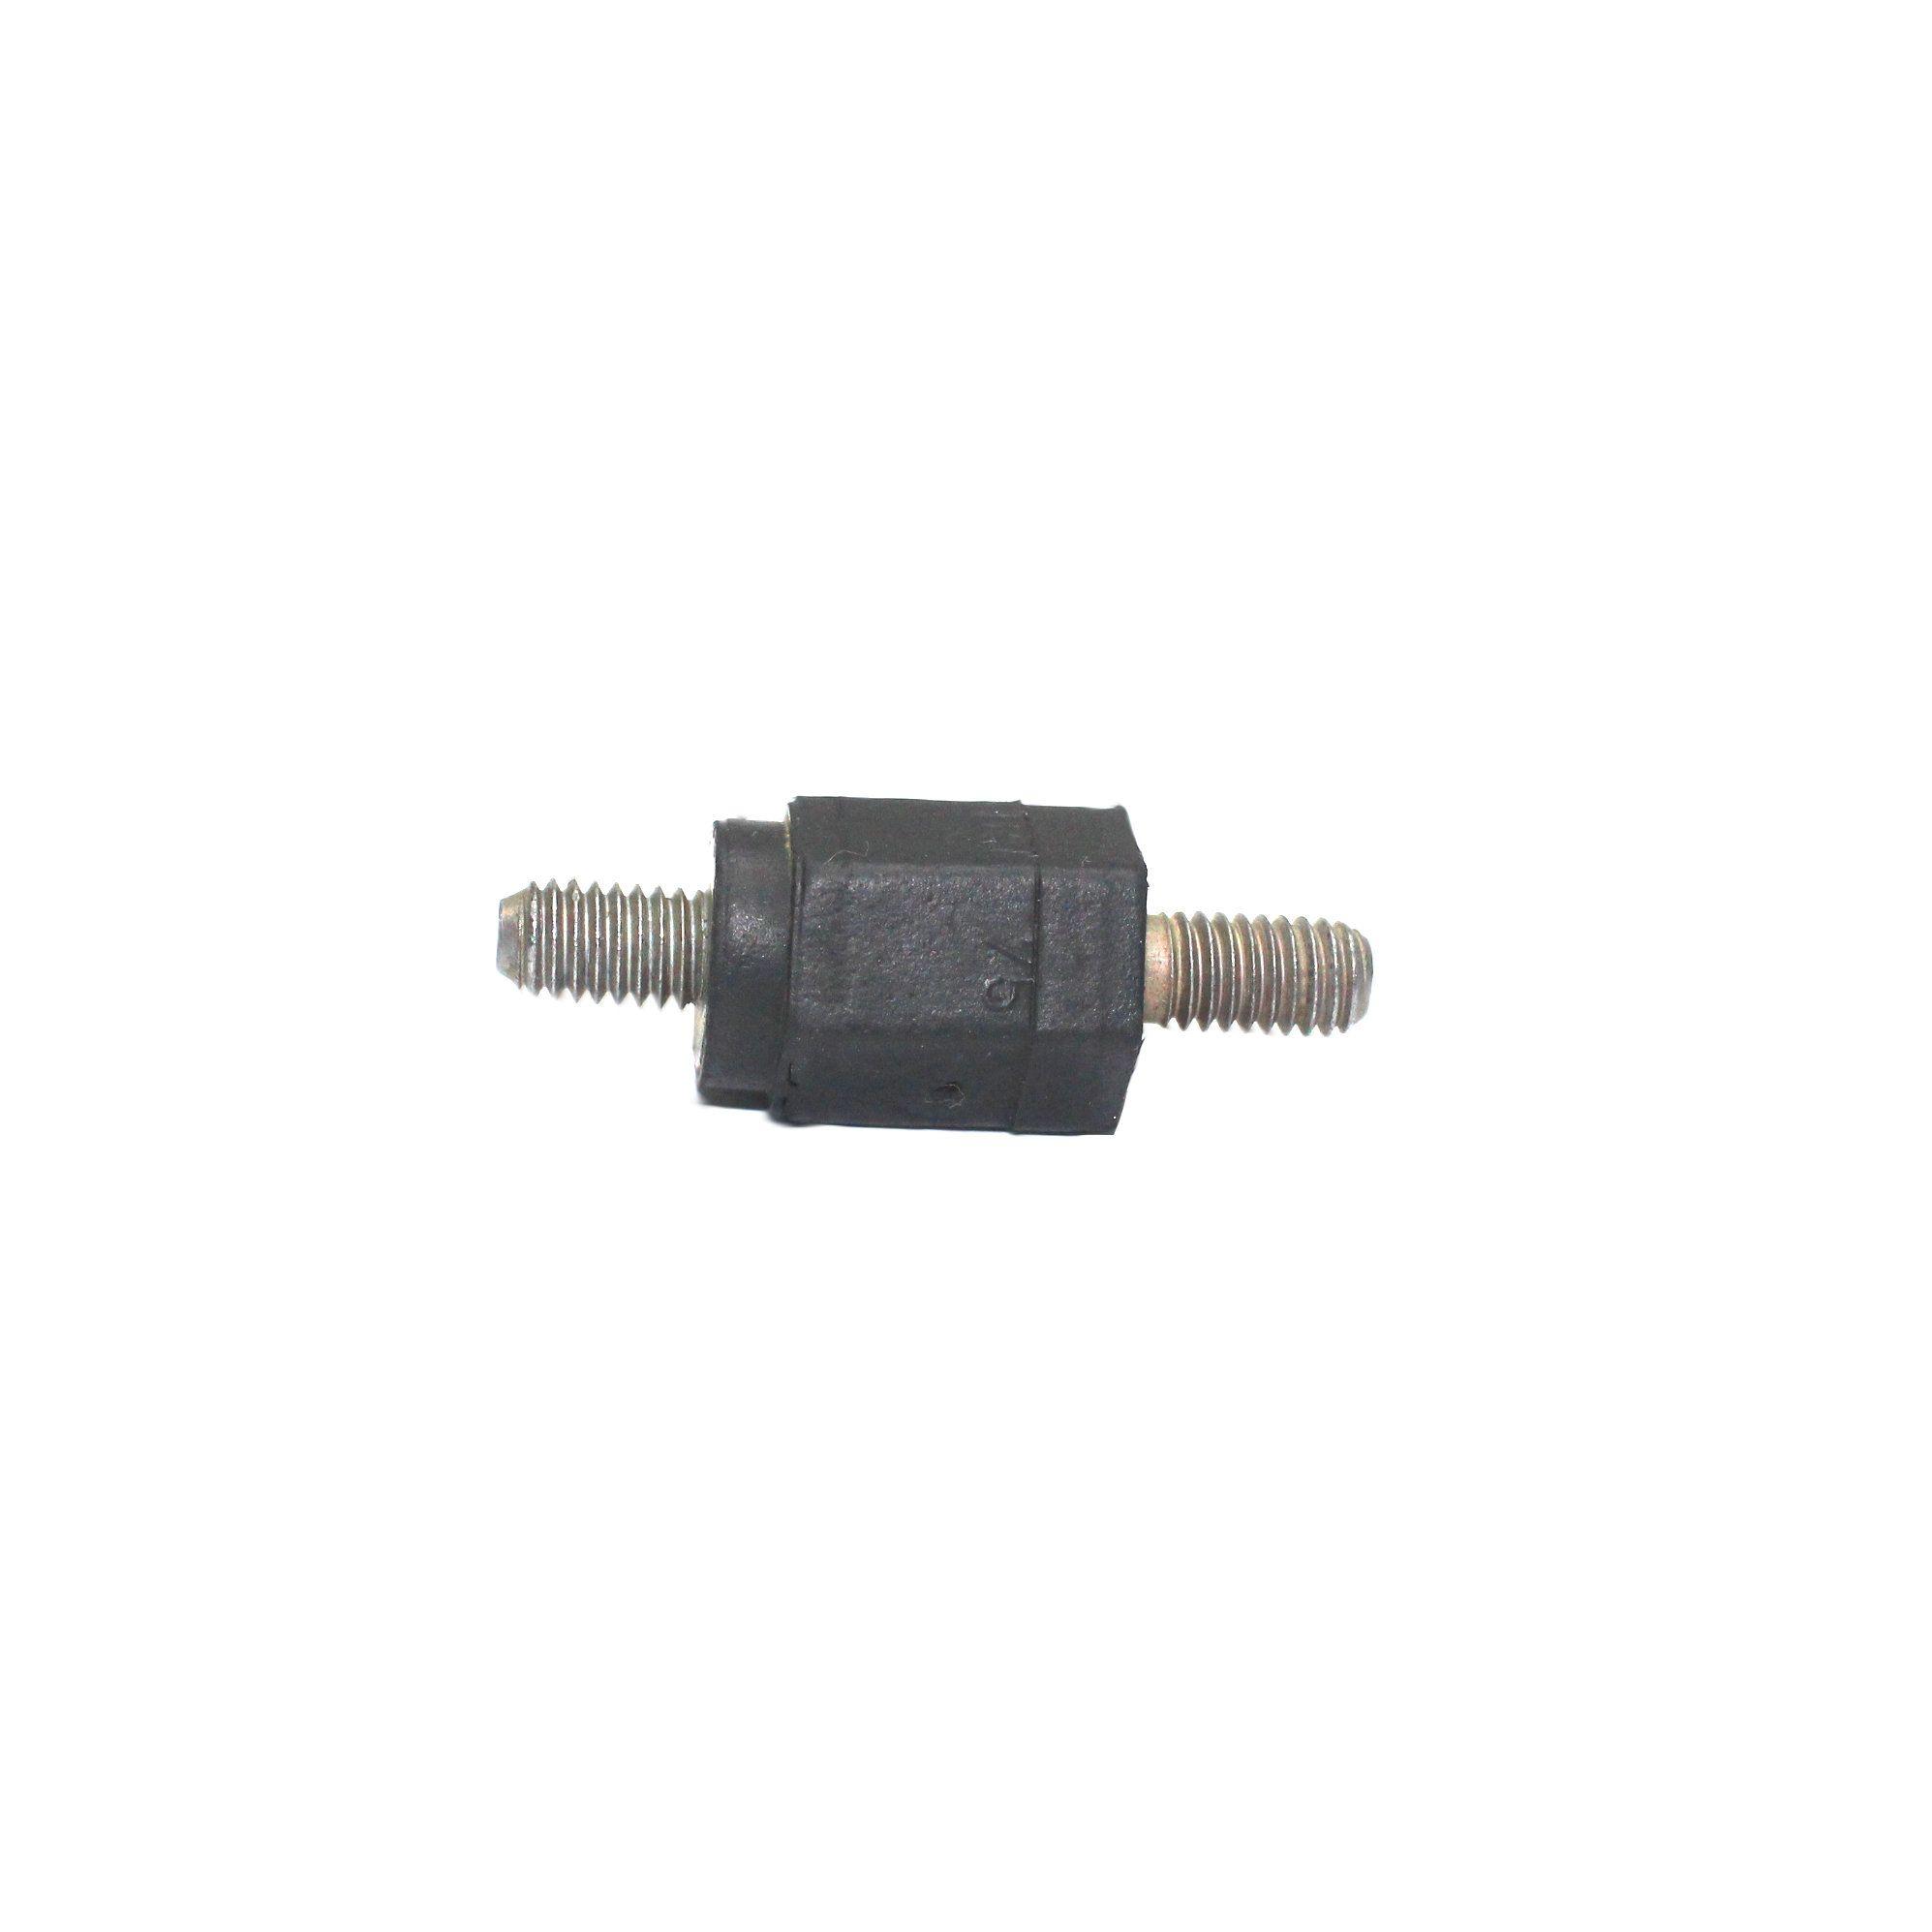 [3 uni] Bucha Coxim Bomba Direção Eletro-hidráulica TRW Astra 99..01